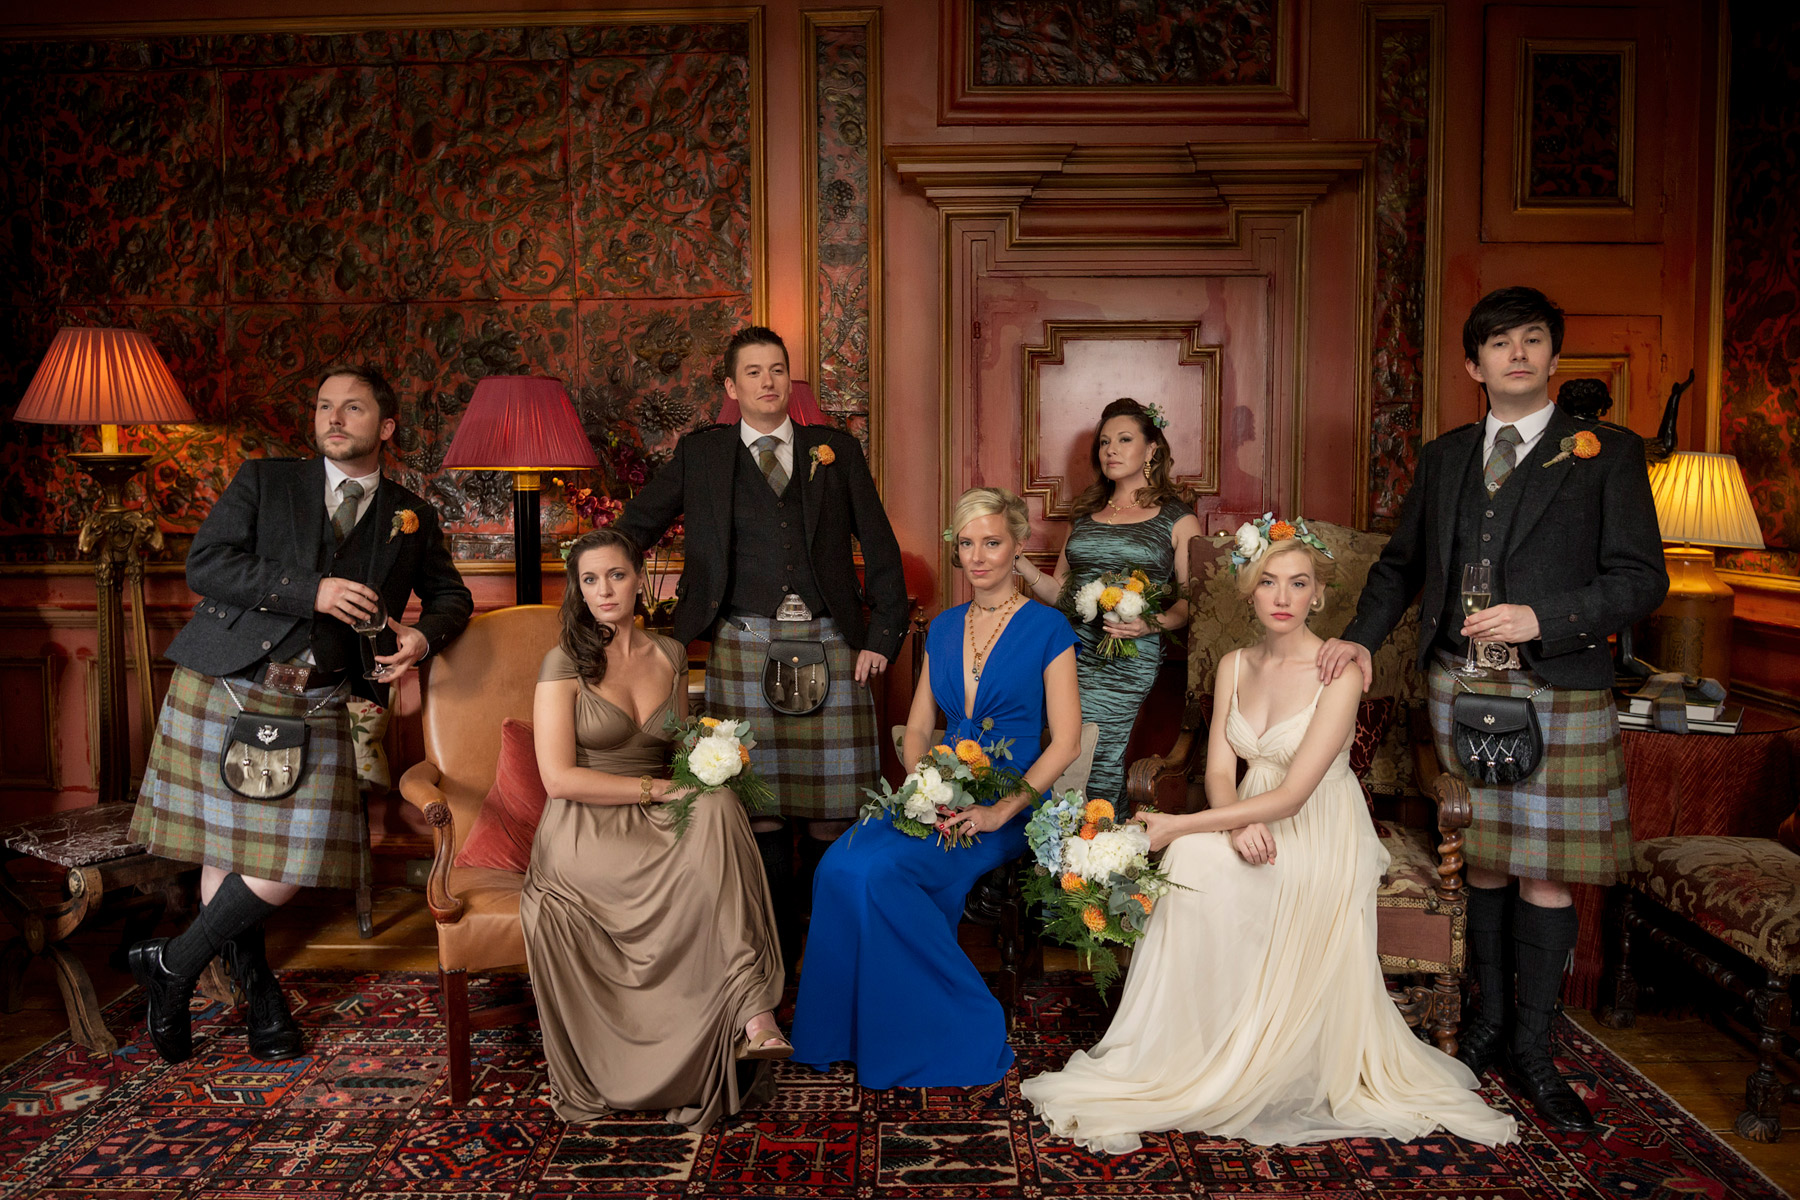 royal tenenbaums style wedding photo edinburgh, scotland